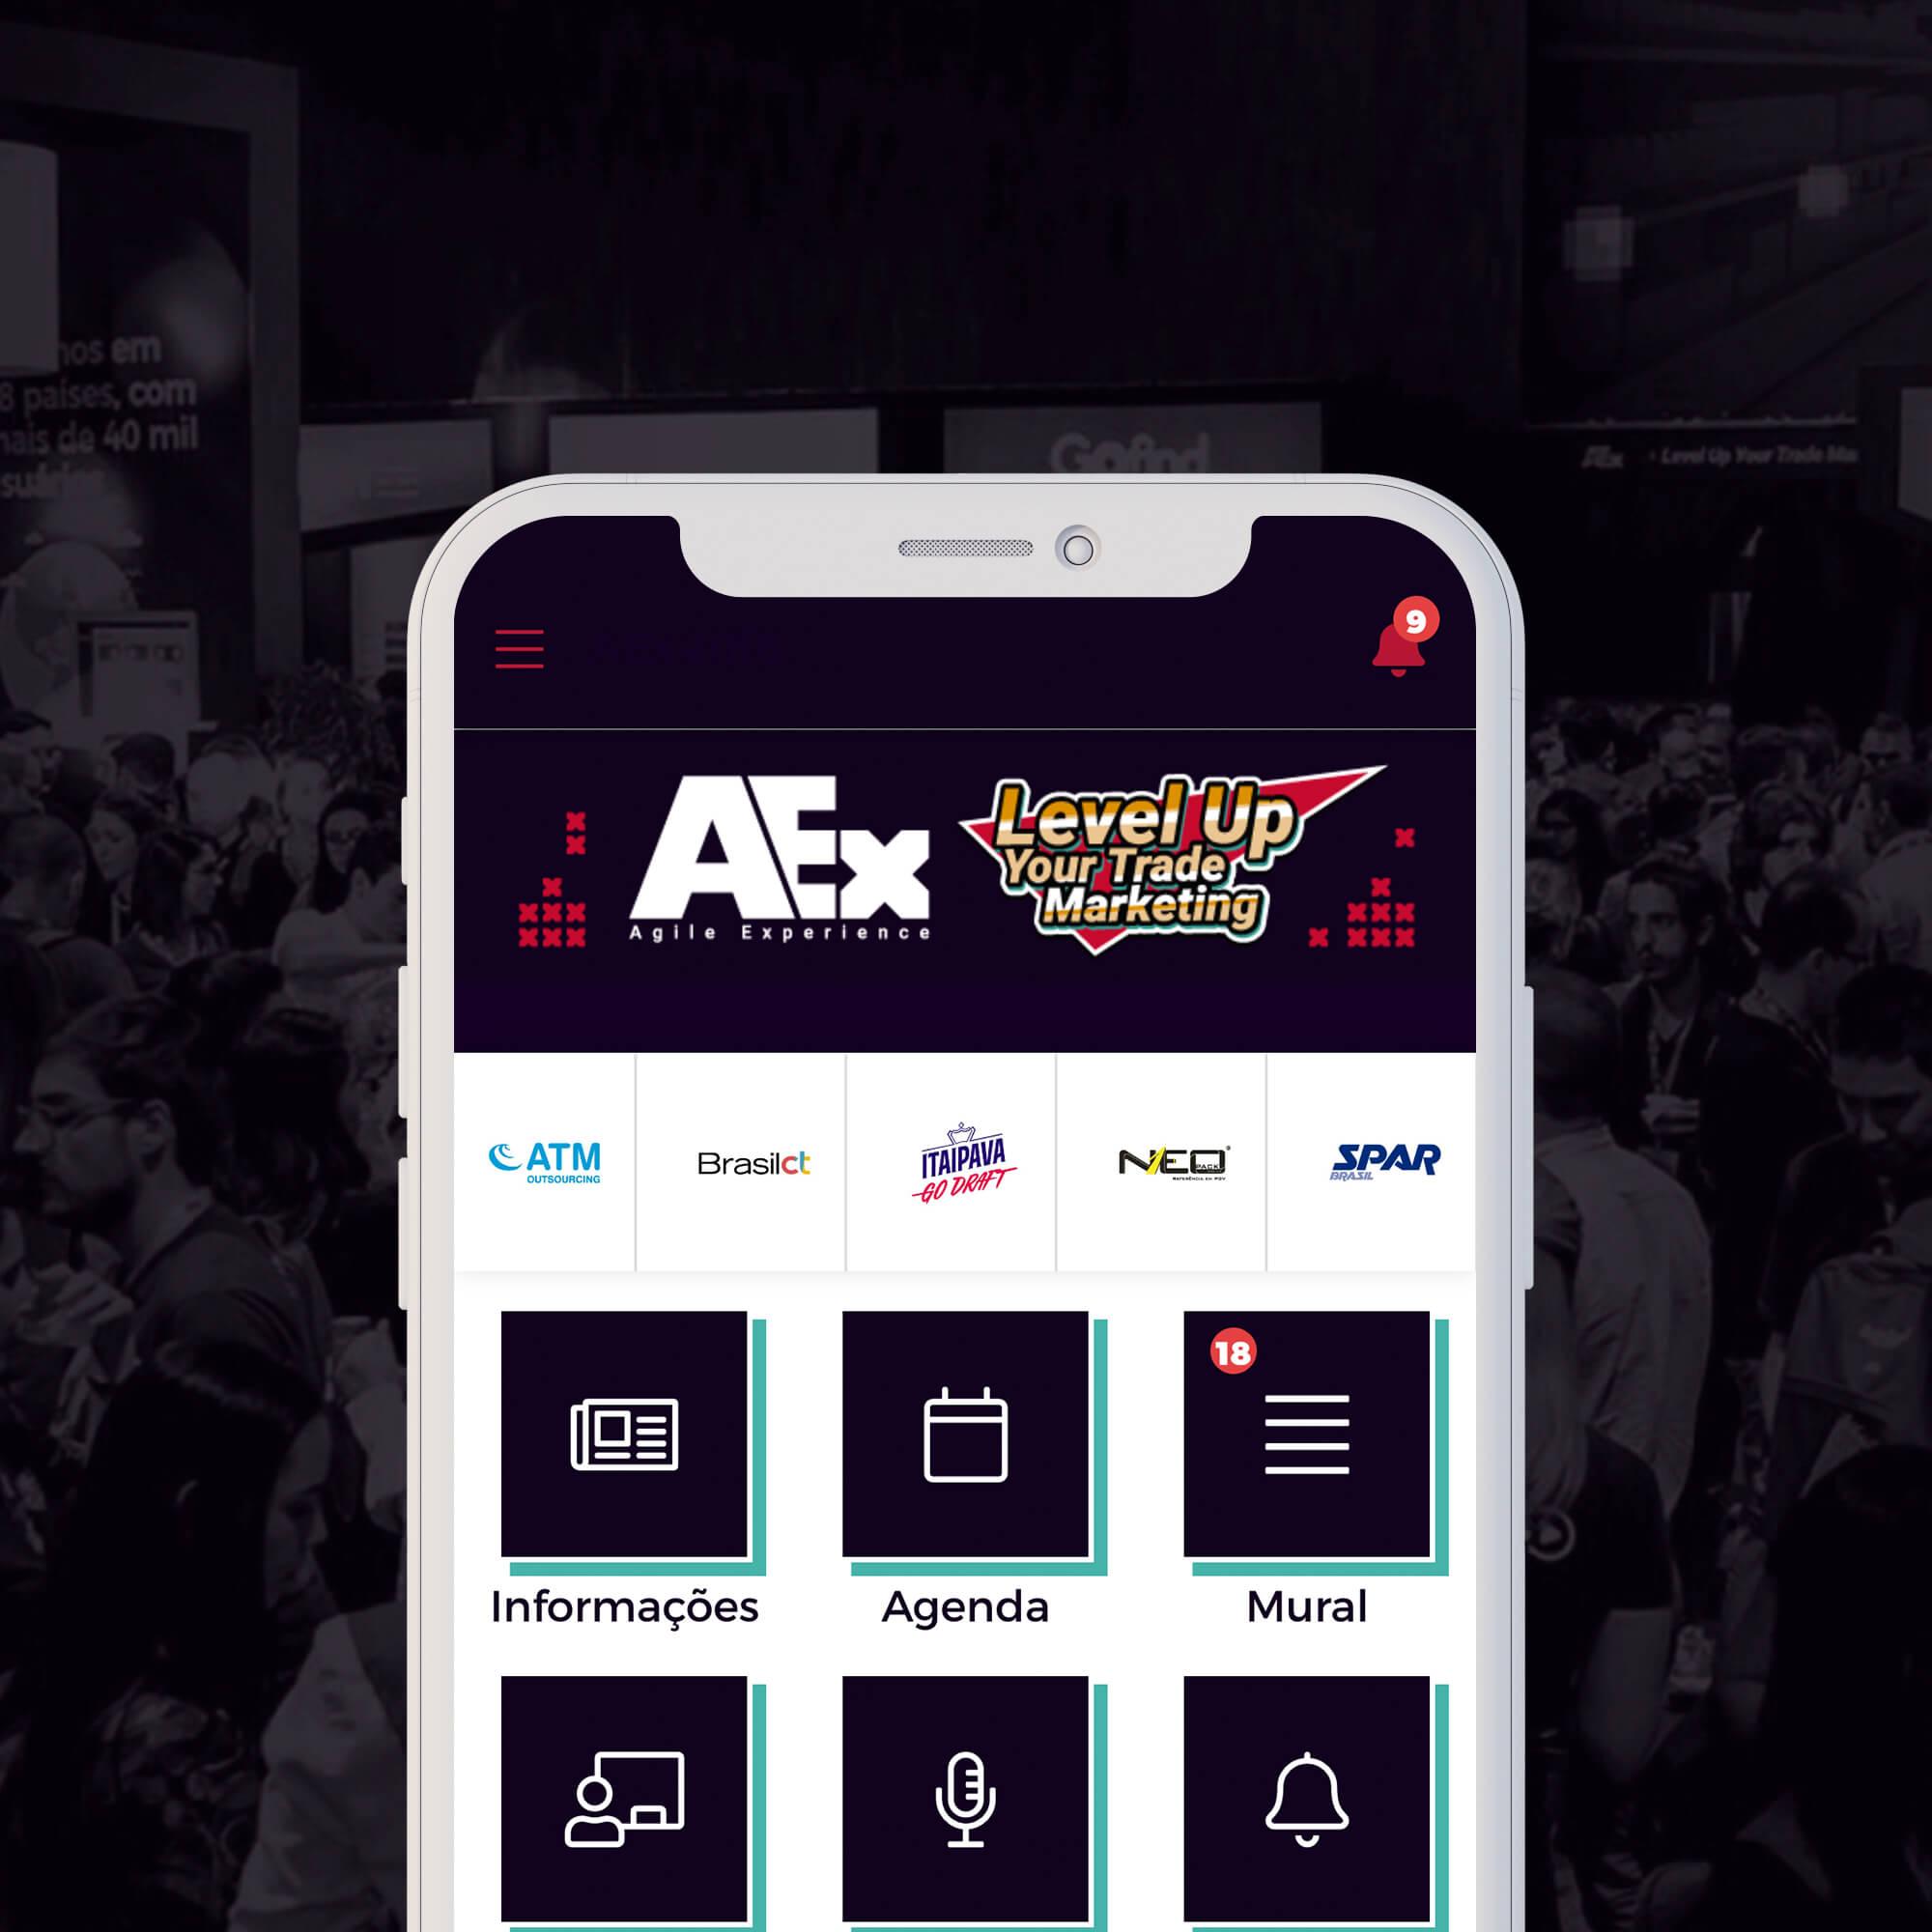 AEx (Agile Experience)